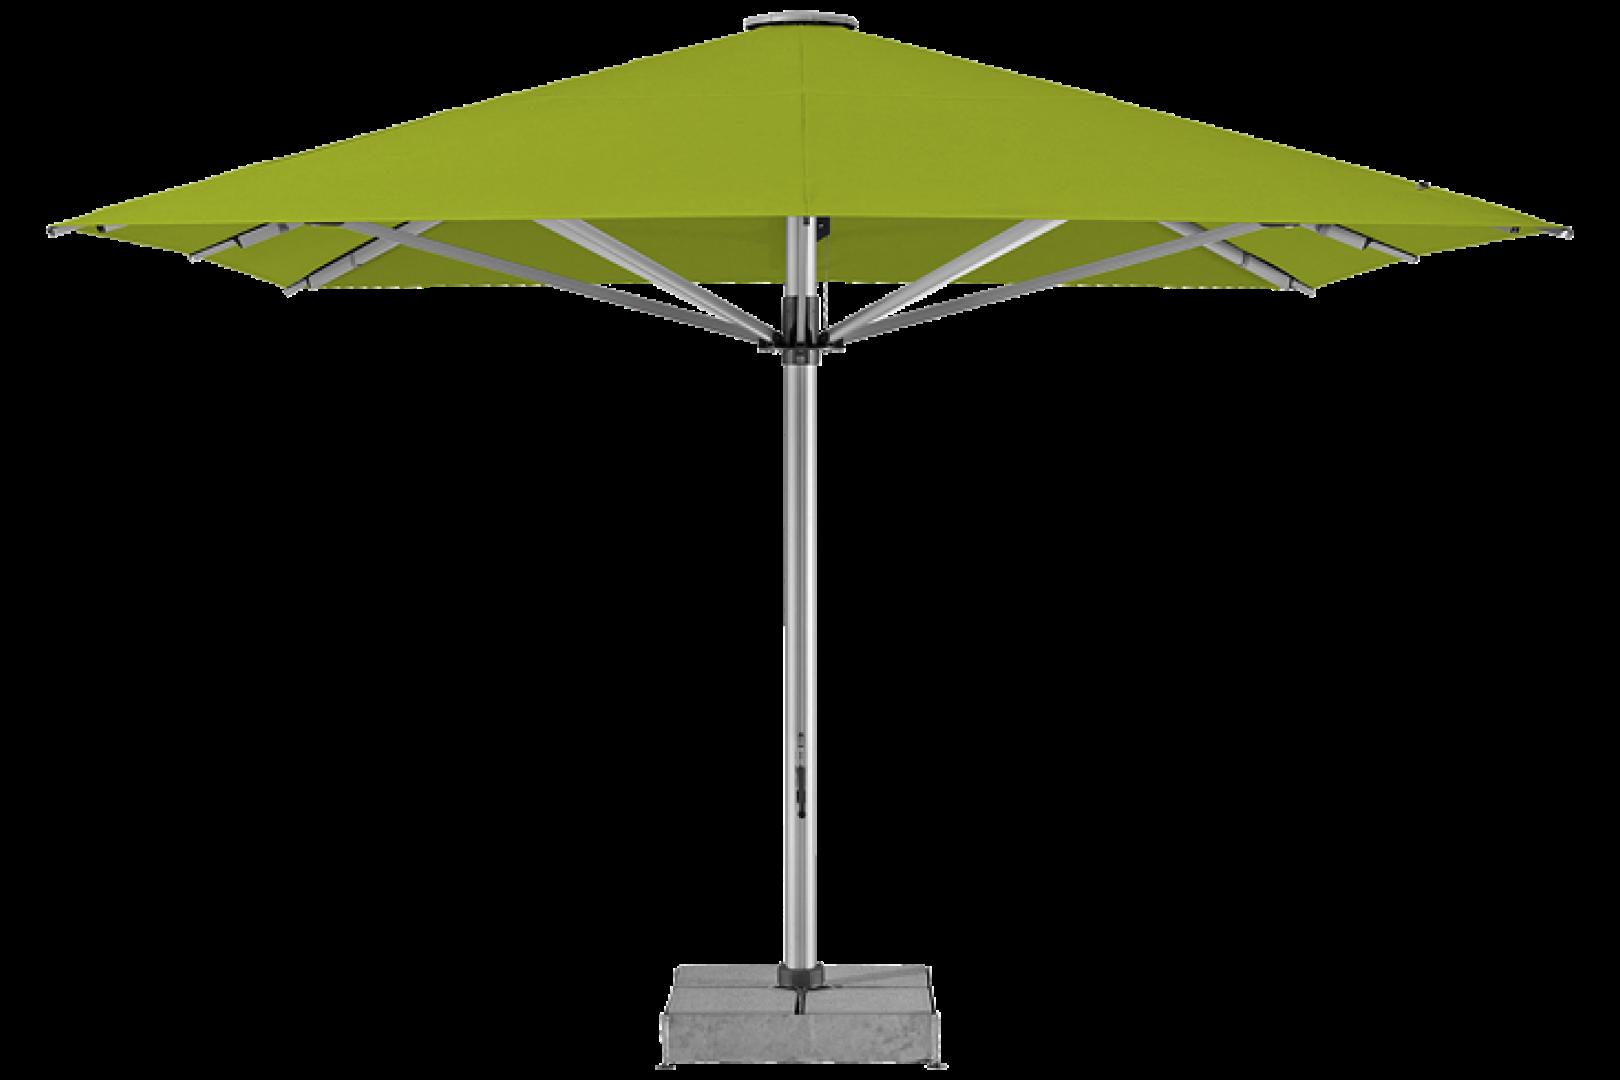 Palazzo-Noblesse-Square-654-Kiwi-Umbrella-Page.png